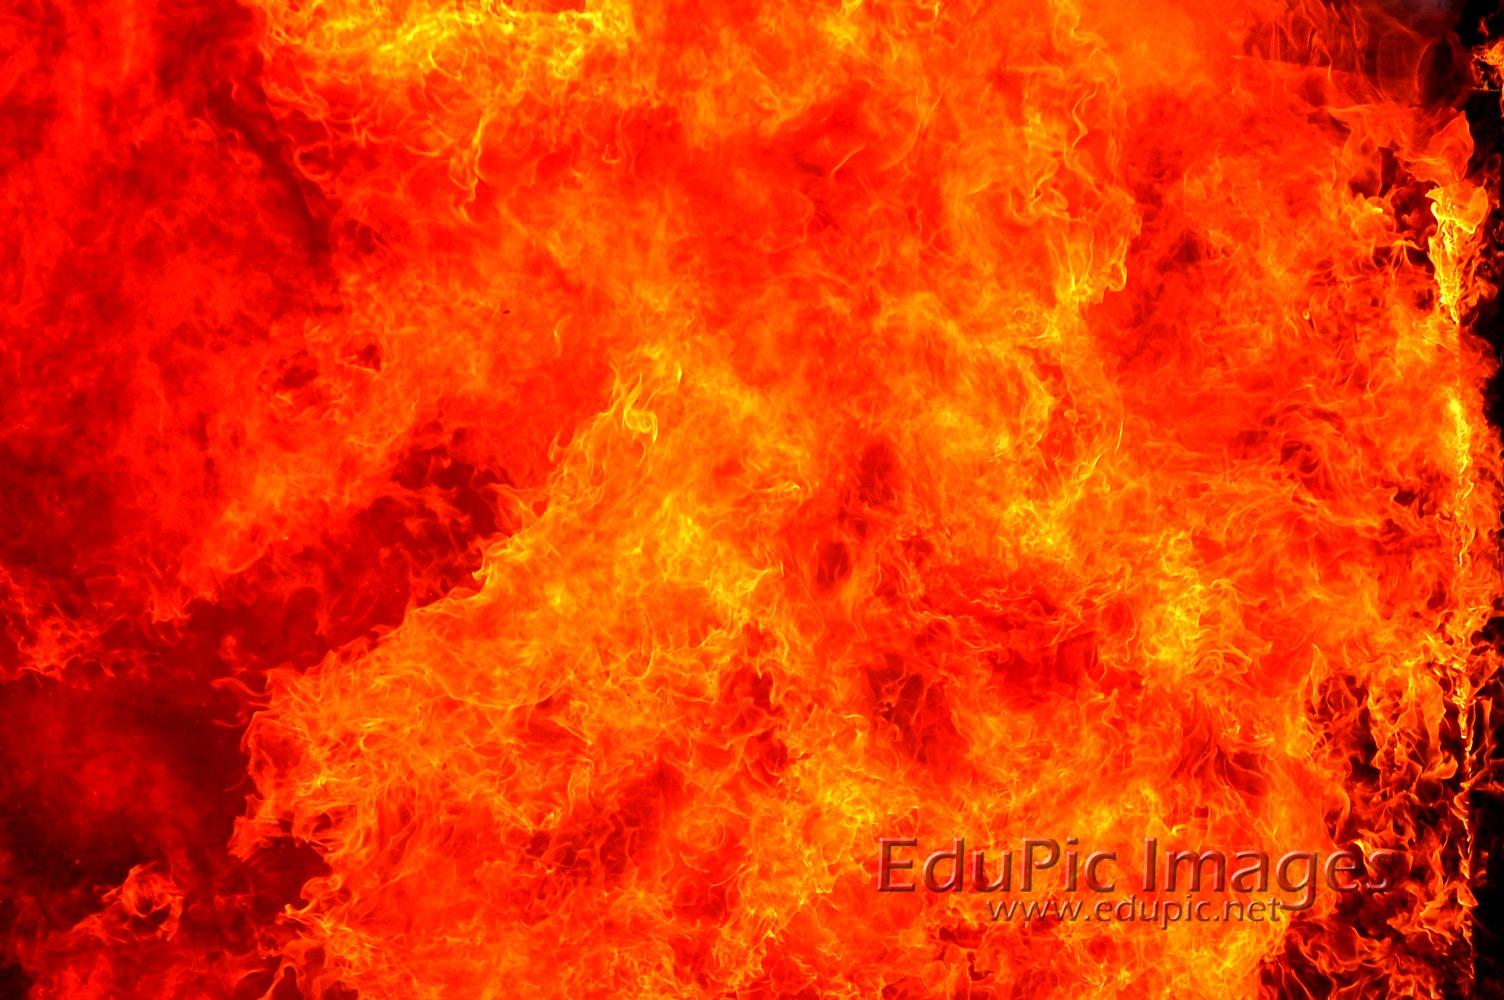 Fire Desktop Image 1504x1000